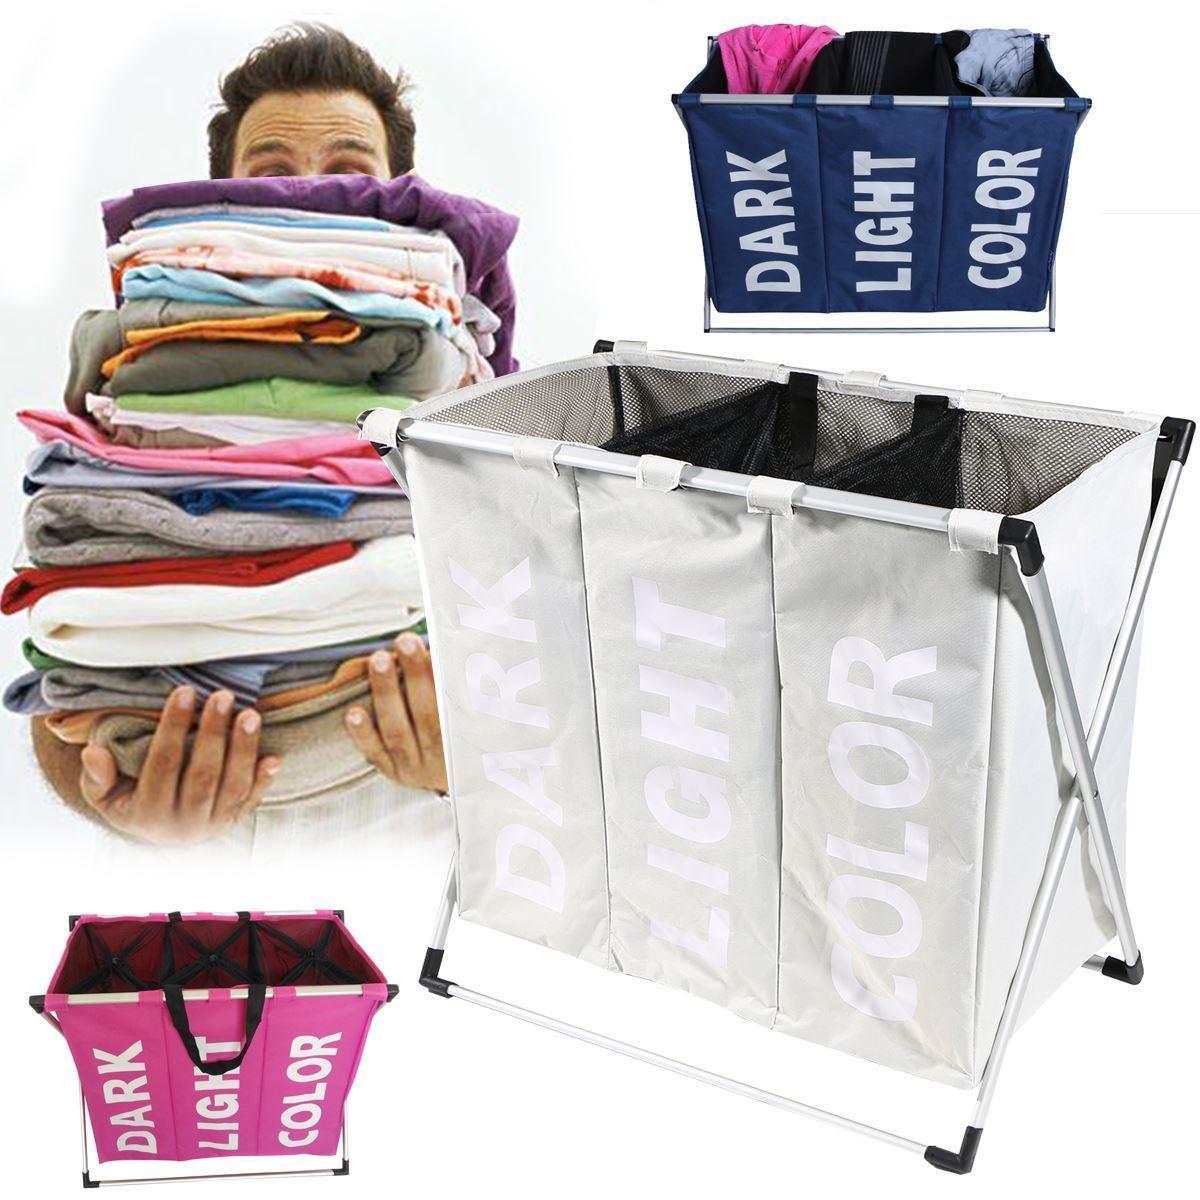 Folding Laundry Hamper Washing 3 Section Laundry Sorter Hamper Clothes Storage Basket Bin Organizer Washing Bag